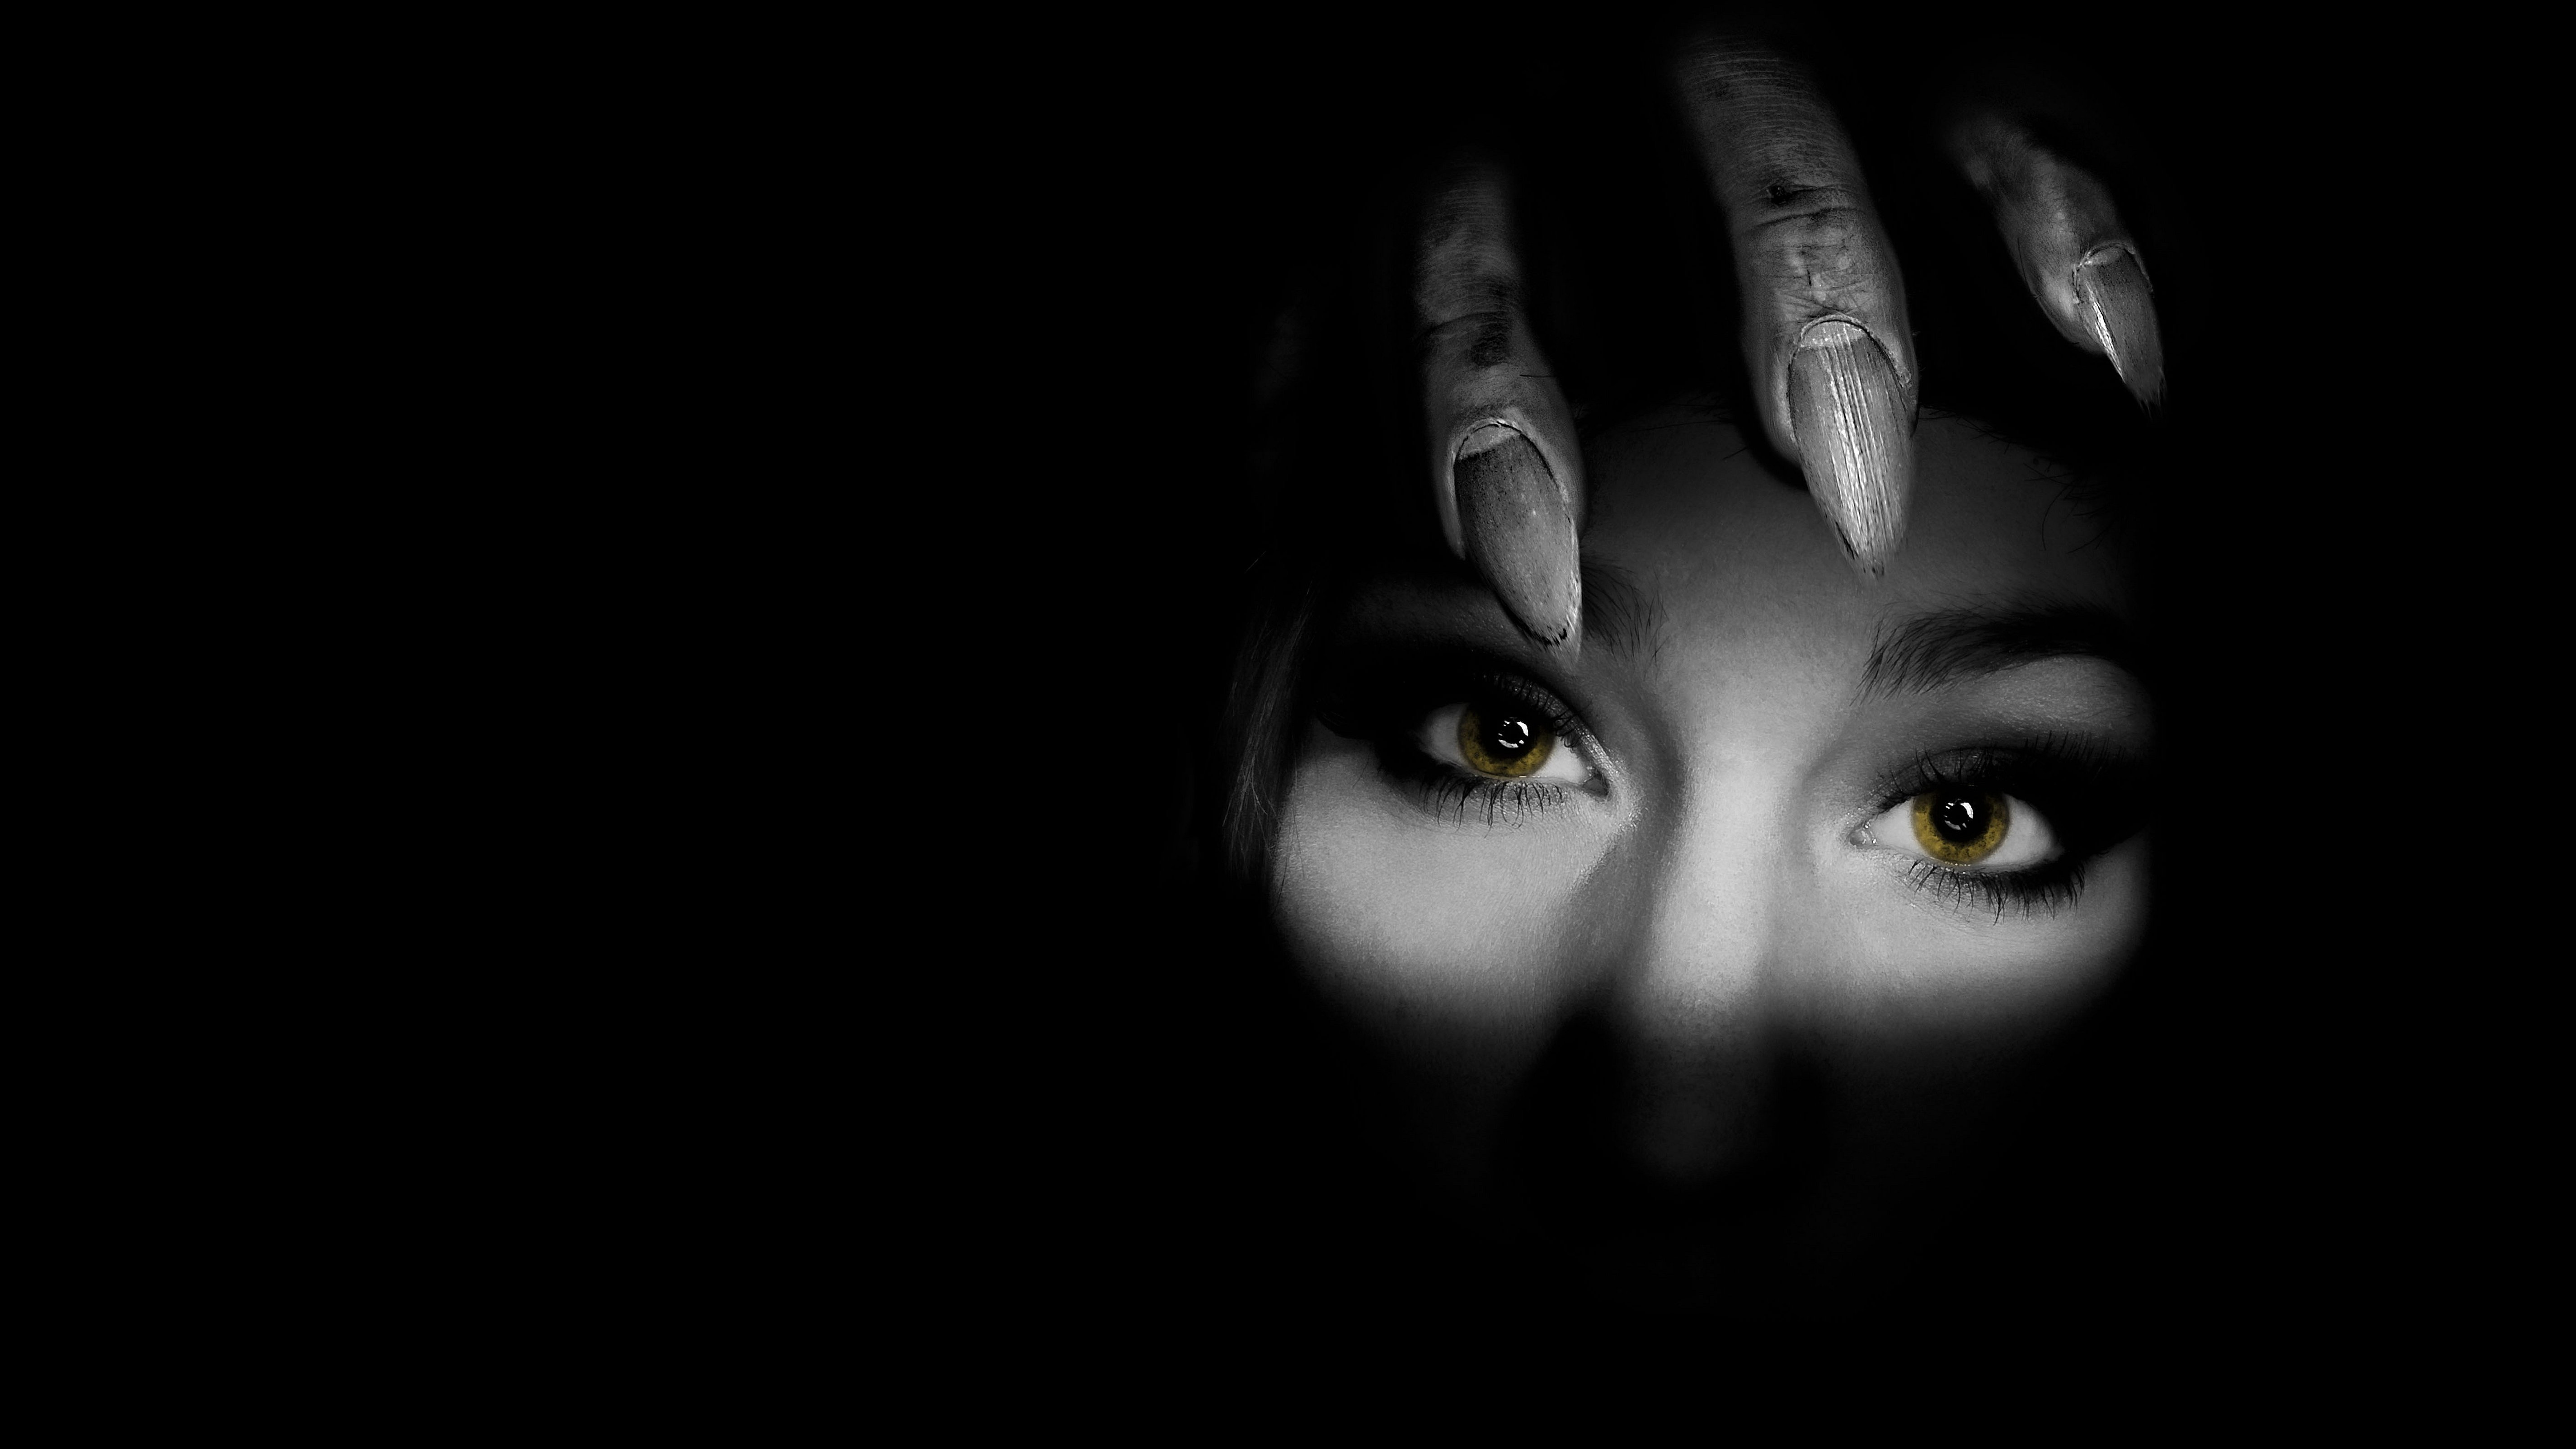 Dark creepy scary horror evil art artistic artwork - Dark horror creepy wallpapers ...